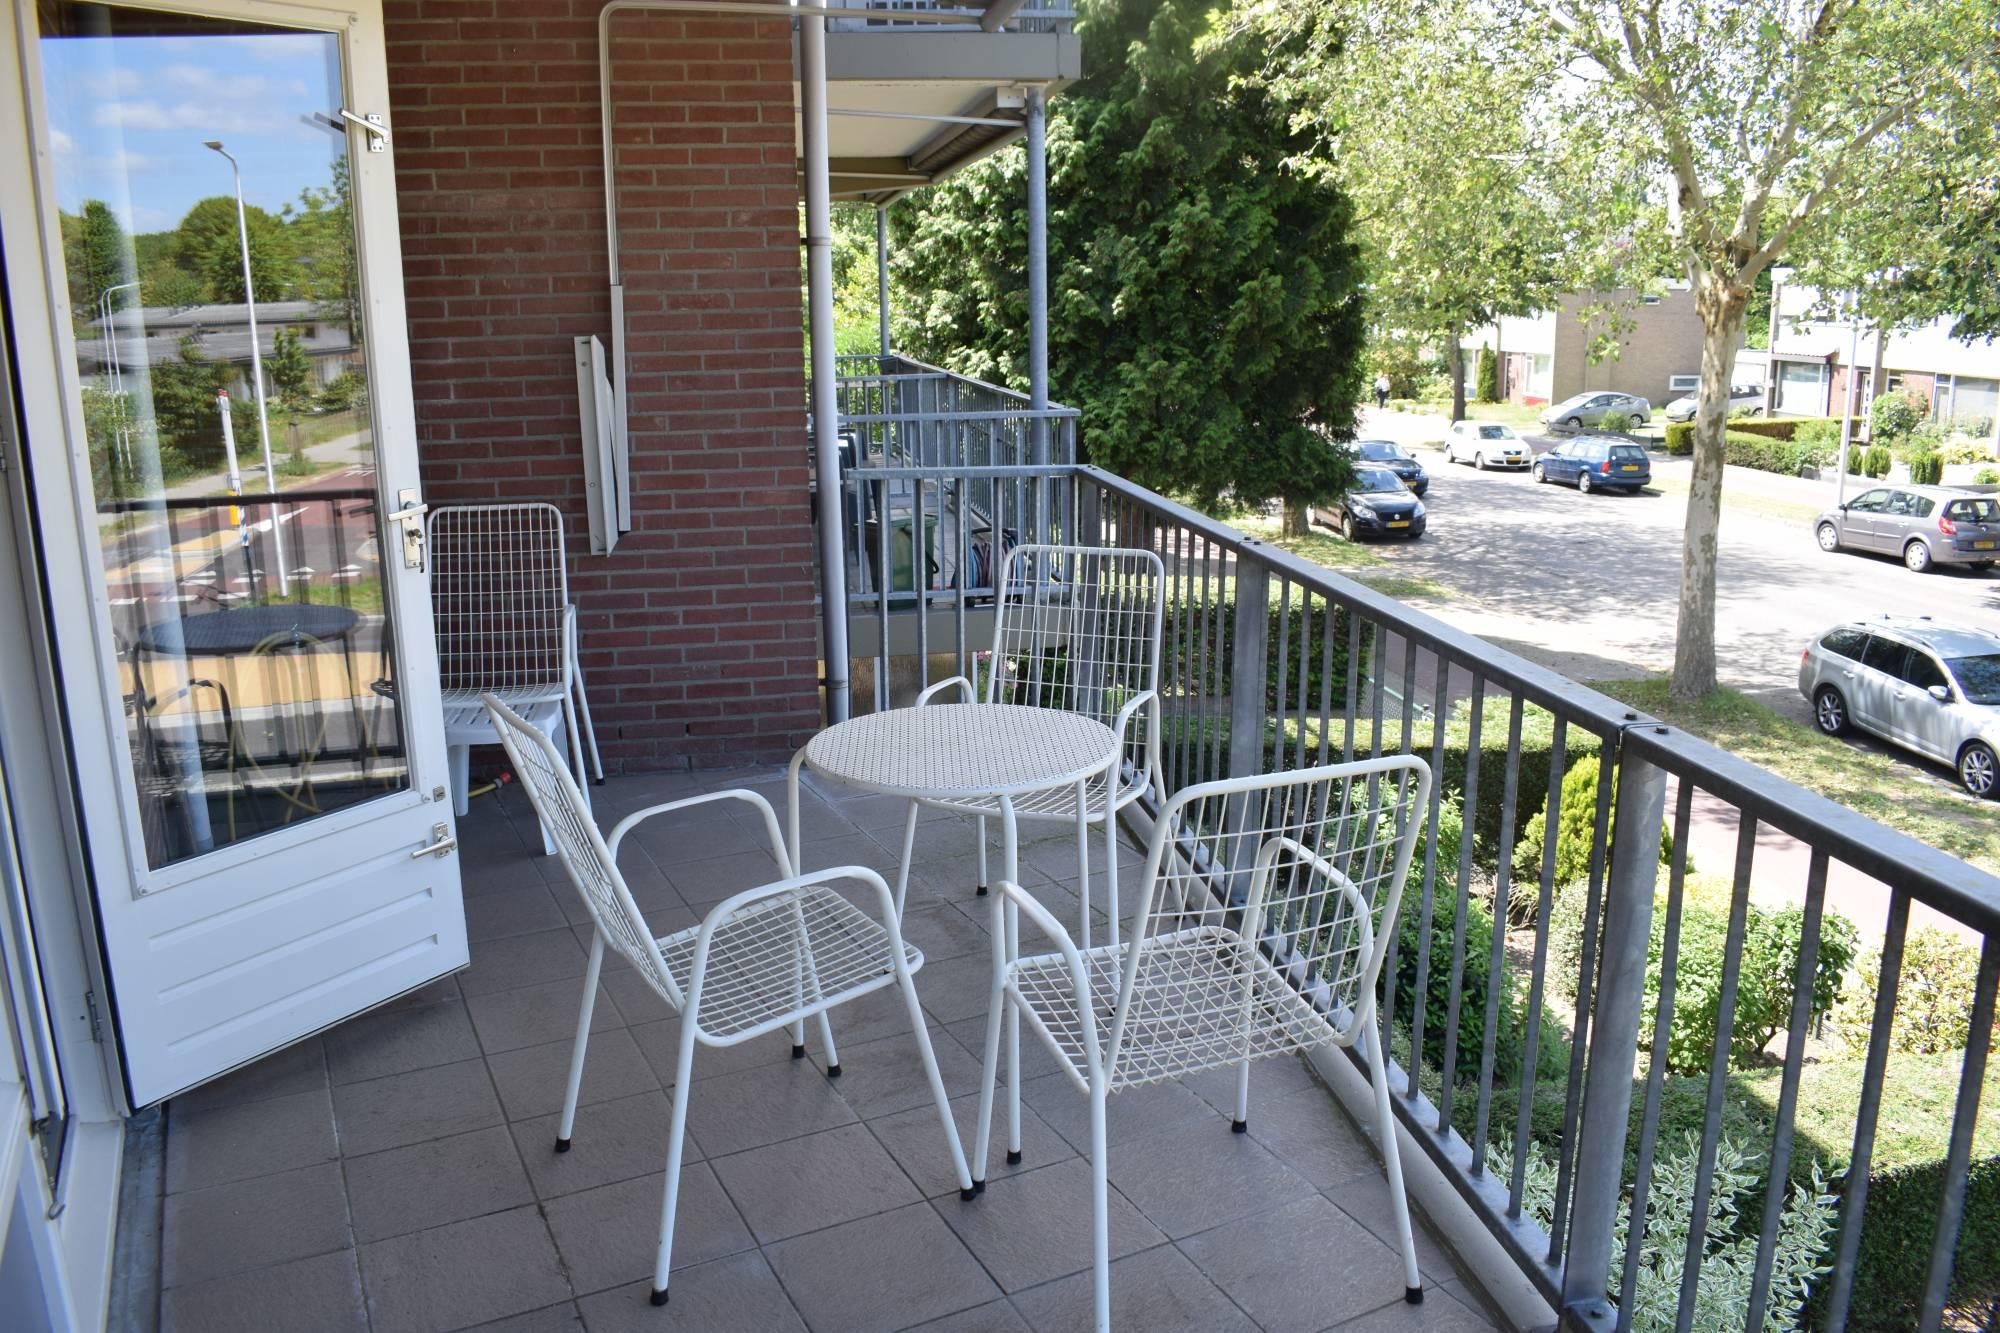 Oude Molenweg, Nijmegen